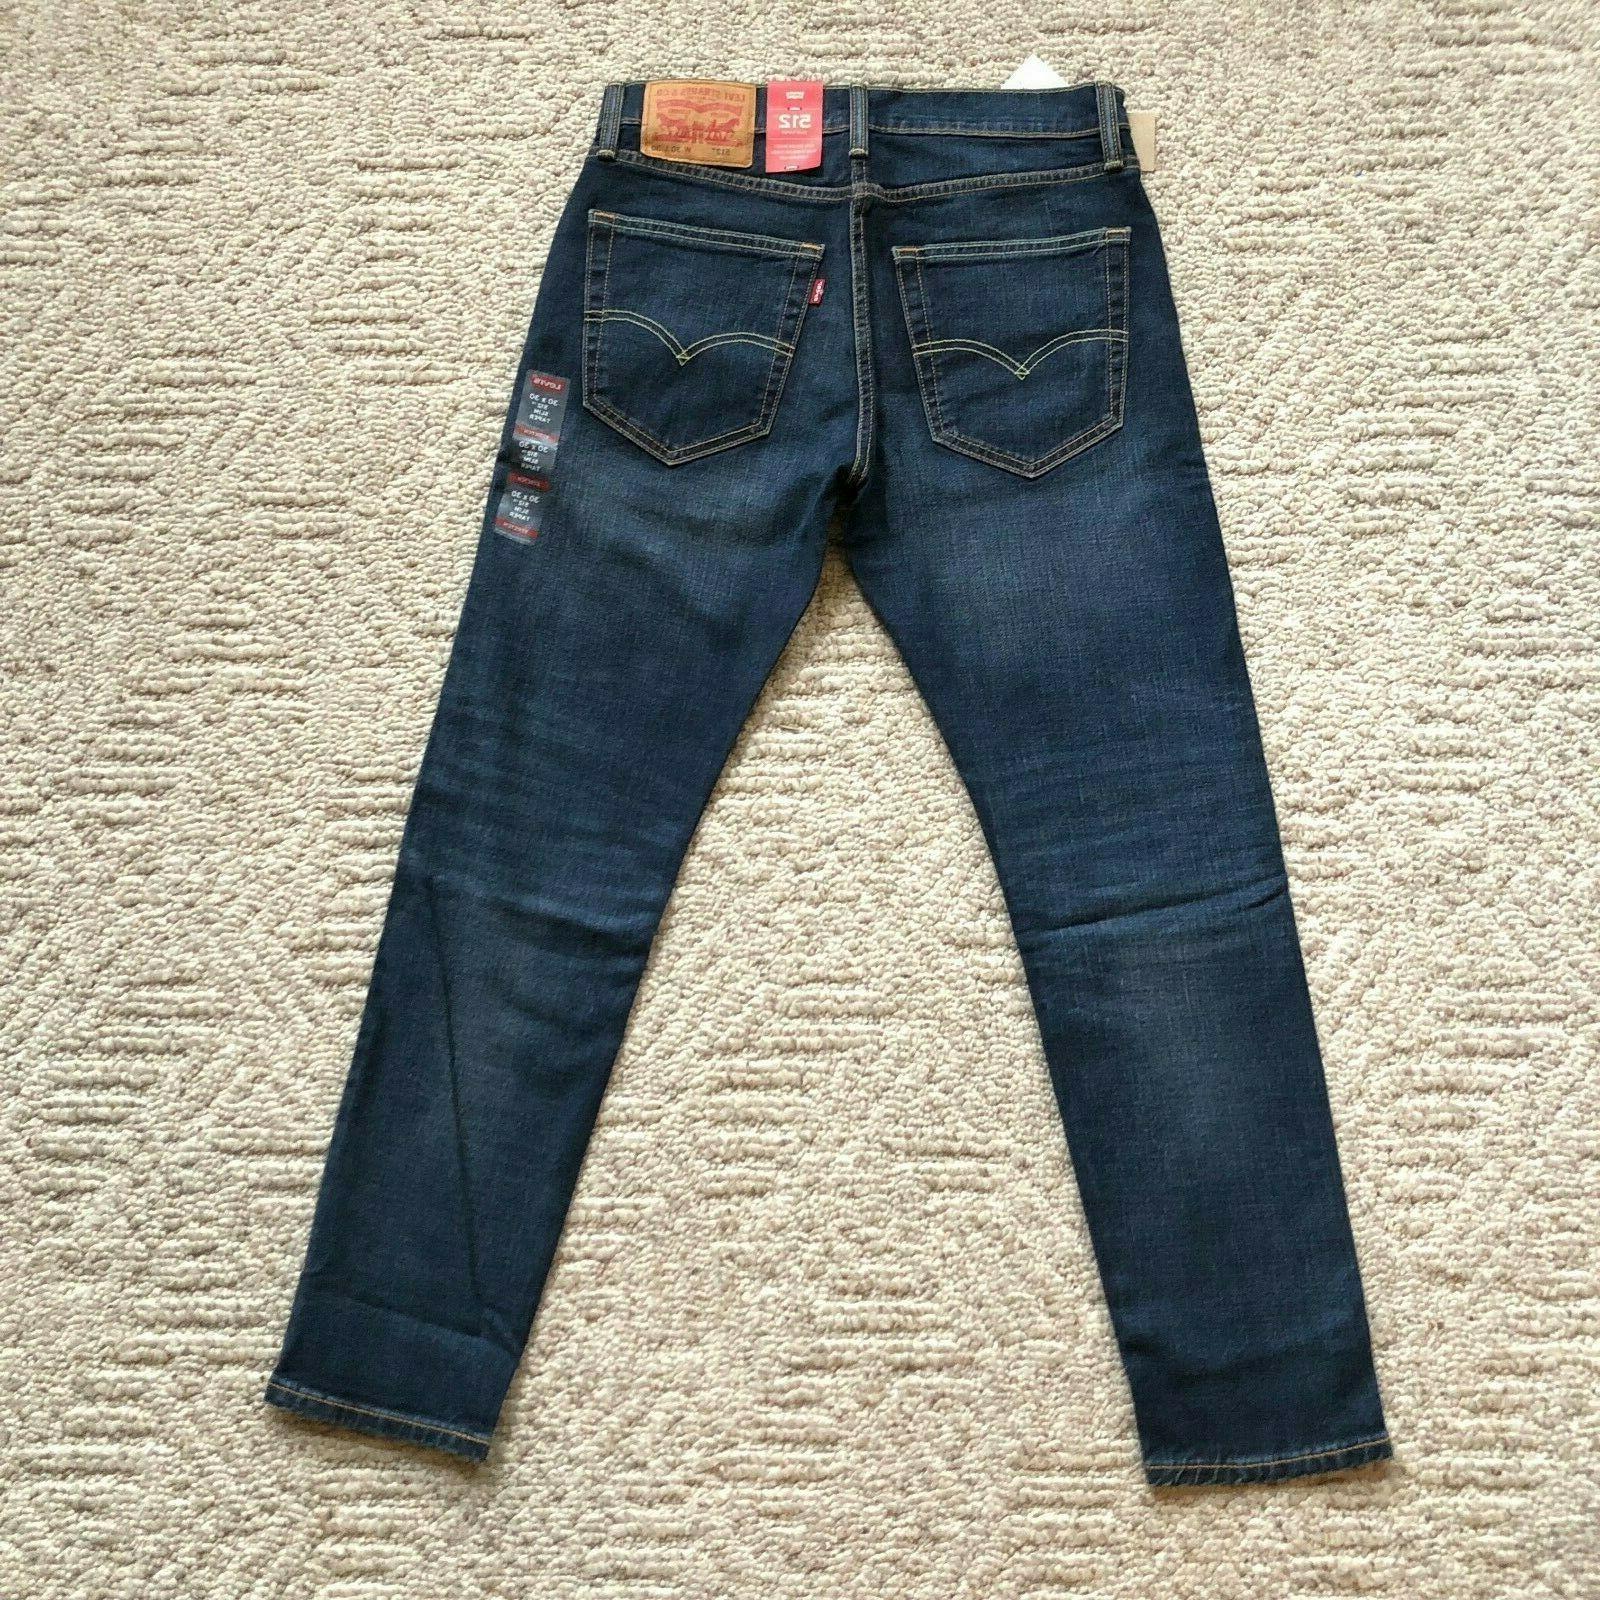 NWT Levi's 512 Slim Fit Tapered Leg Jeans Denim Pants